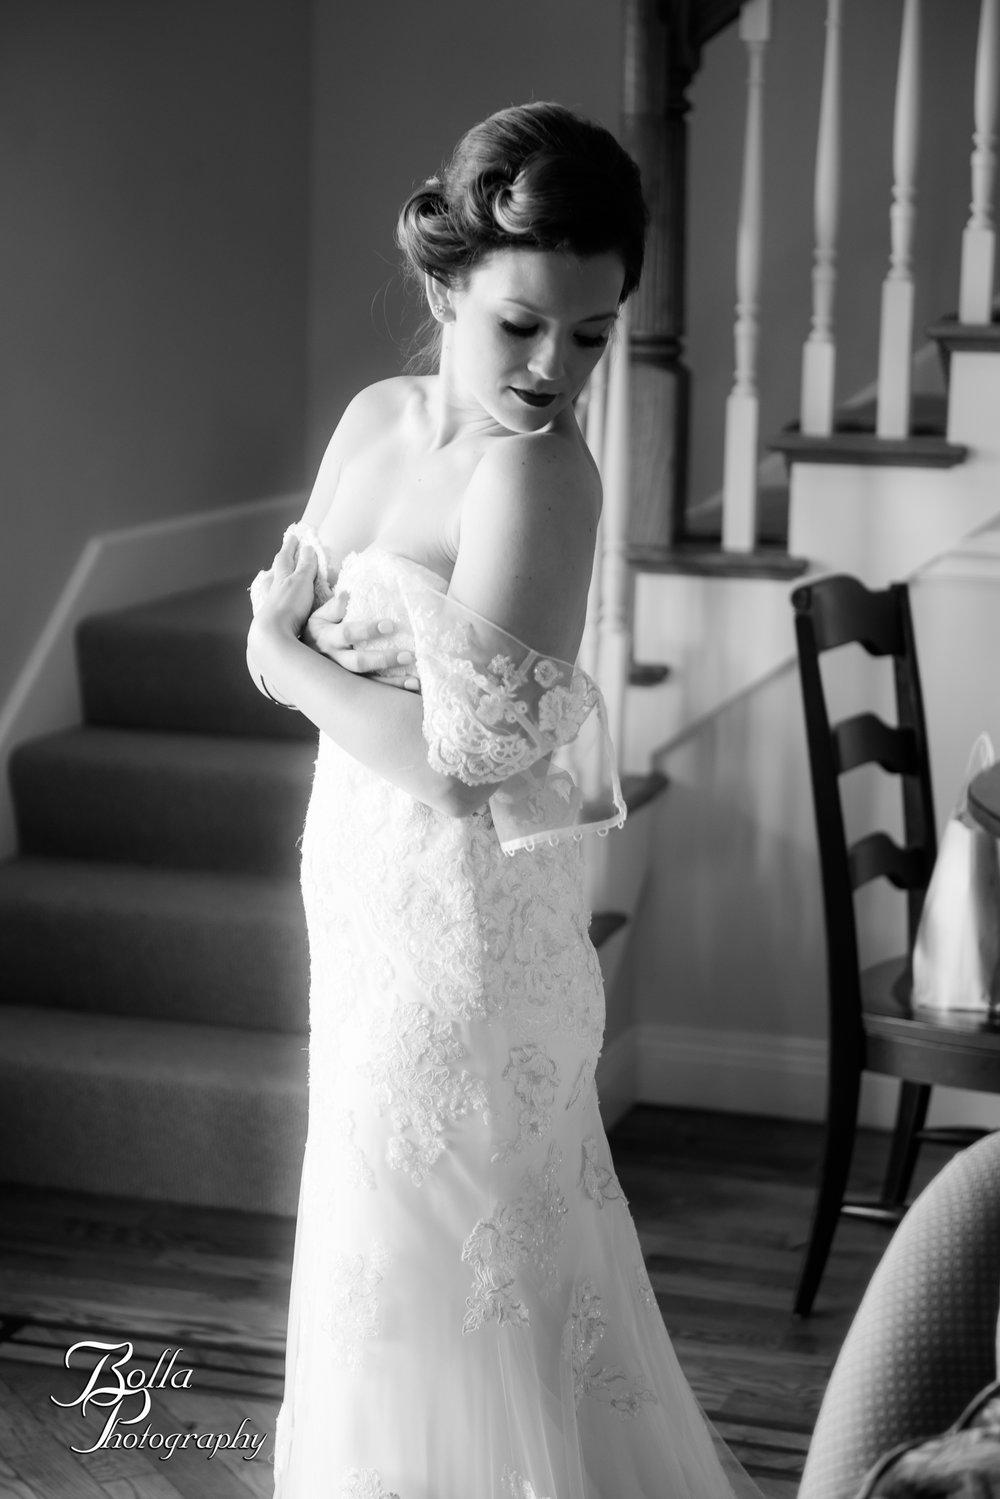 Bolla_photography_edwardsville_wedding_photographer_st_louis_weddings_Chaumette_winery_Mikusch-0088.jpg